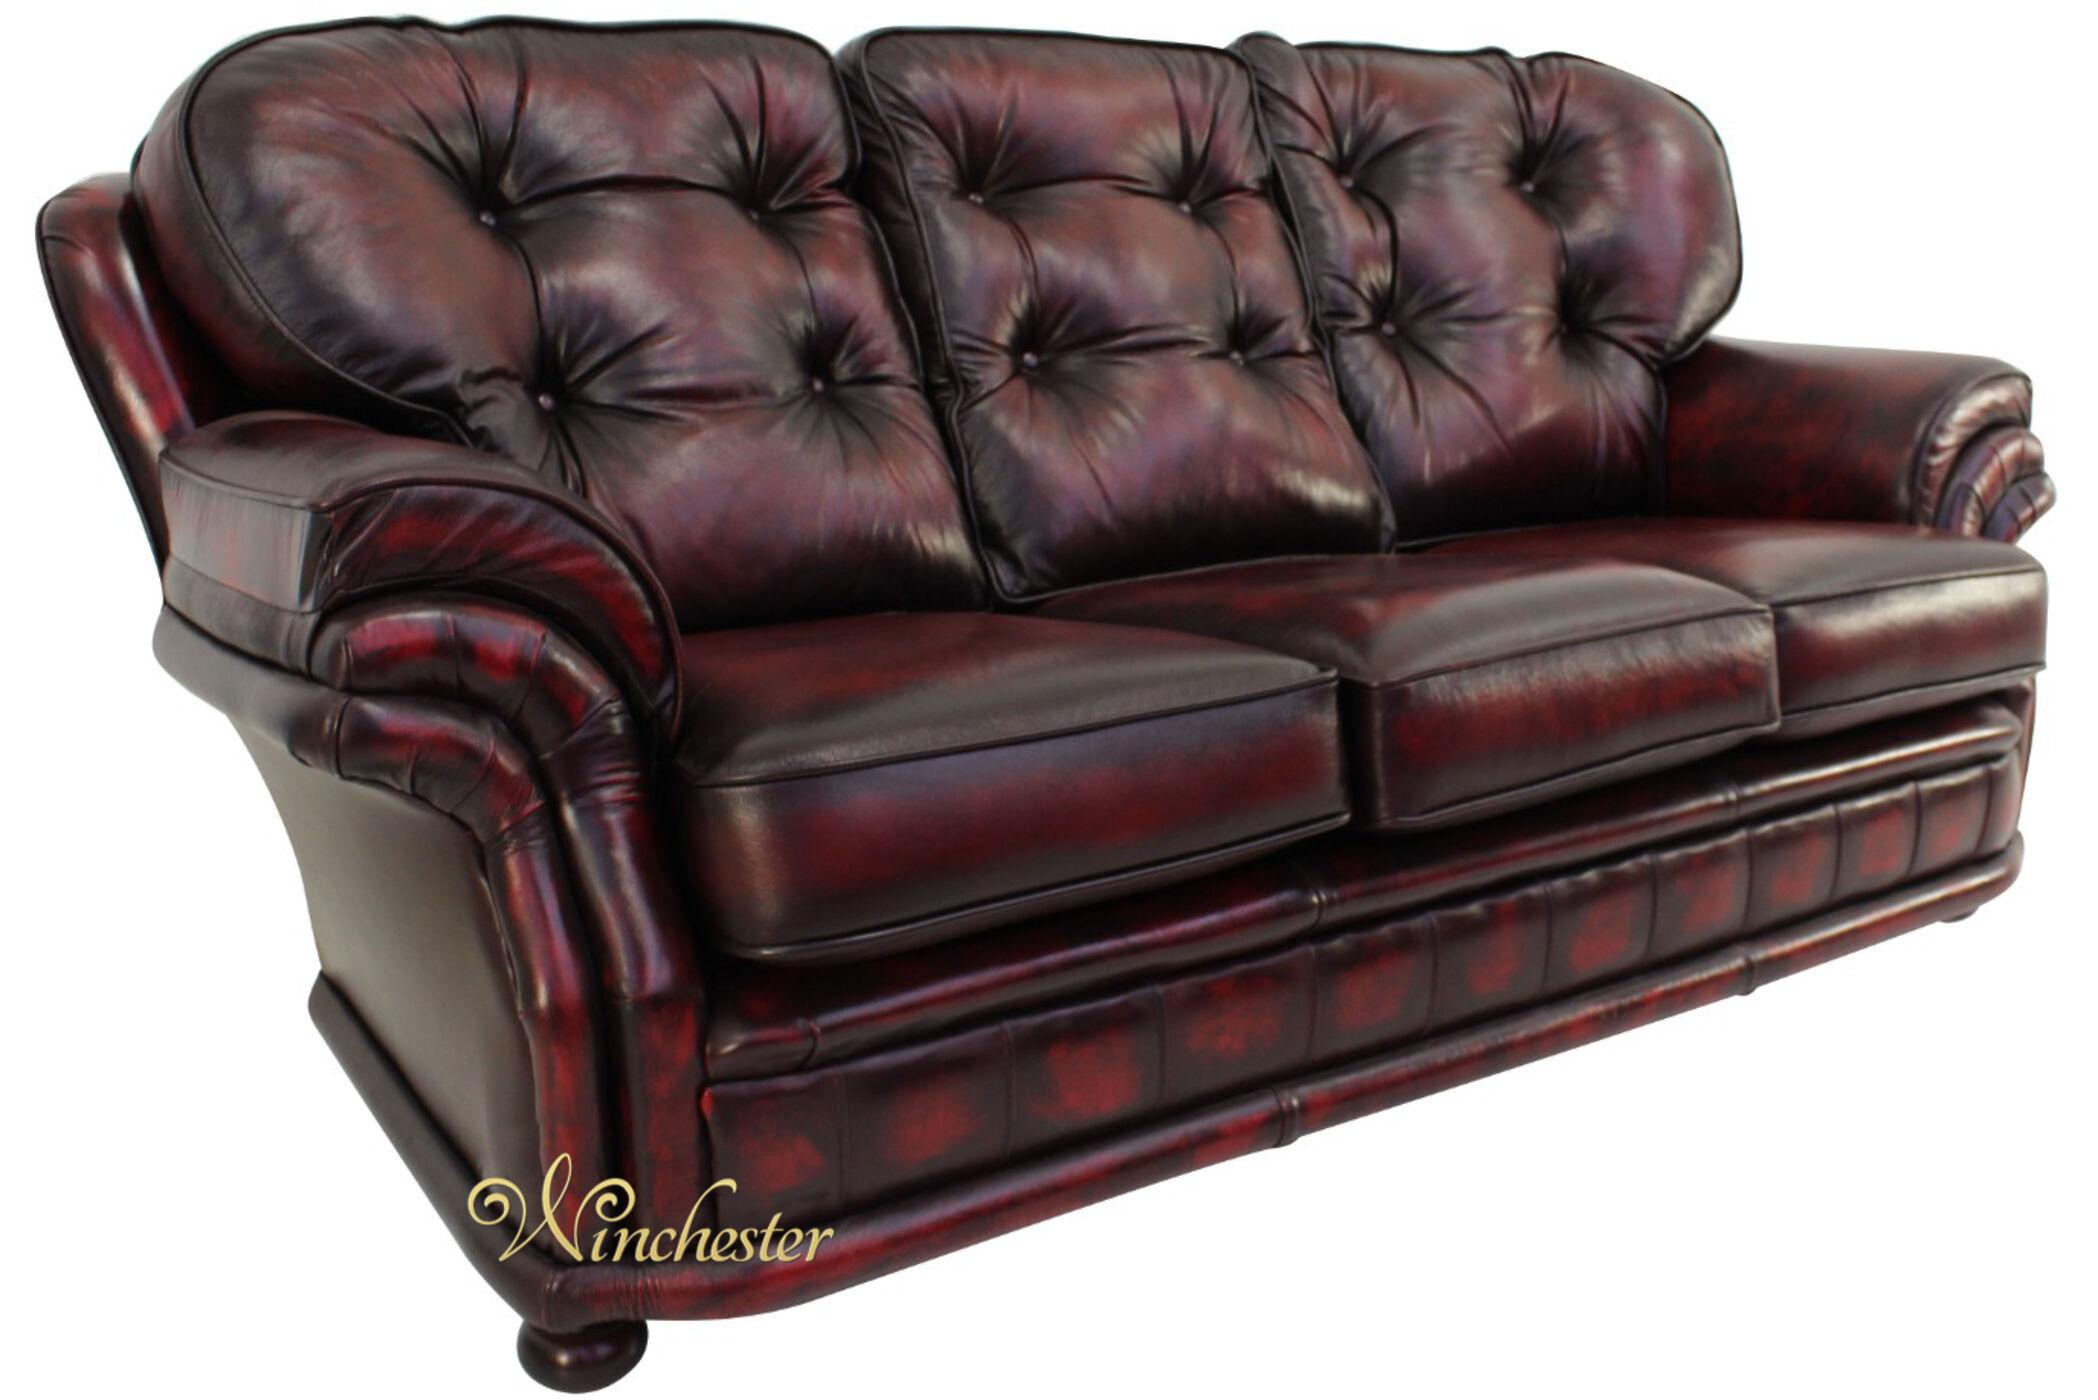 Chesterfield Knightsbridge Leather Sofa Wc